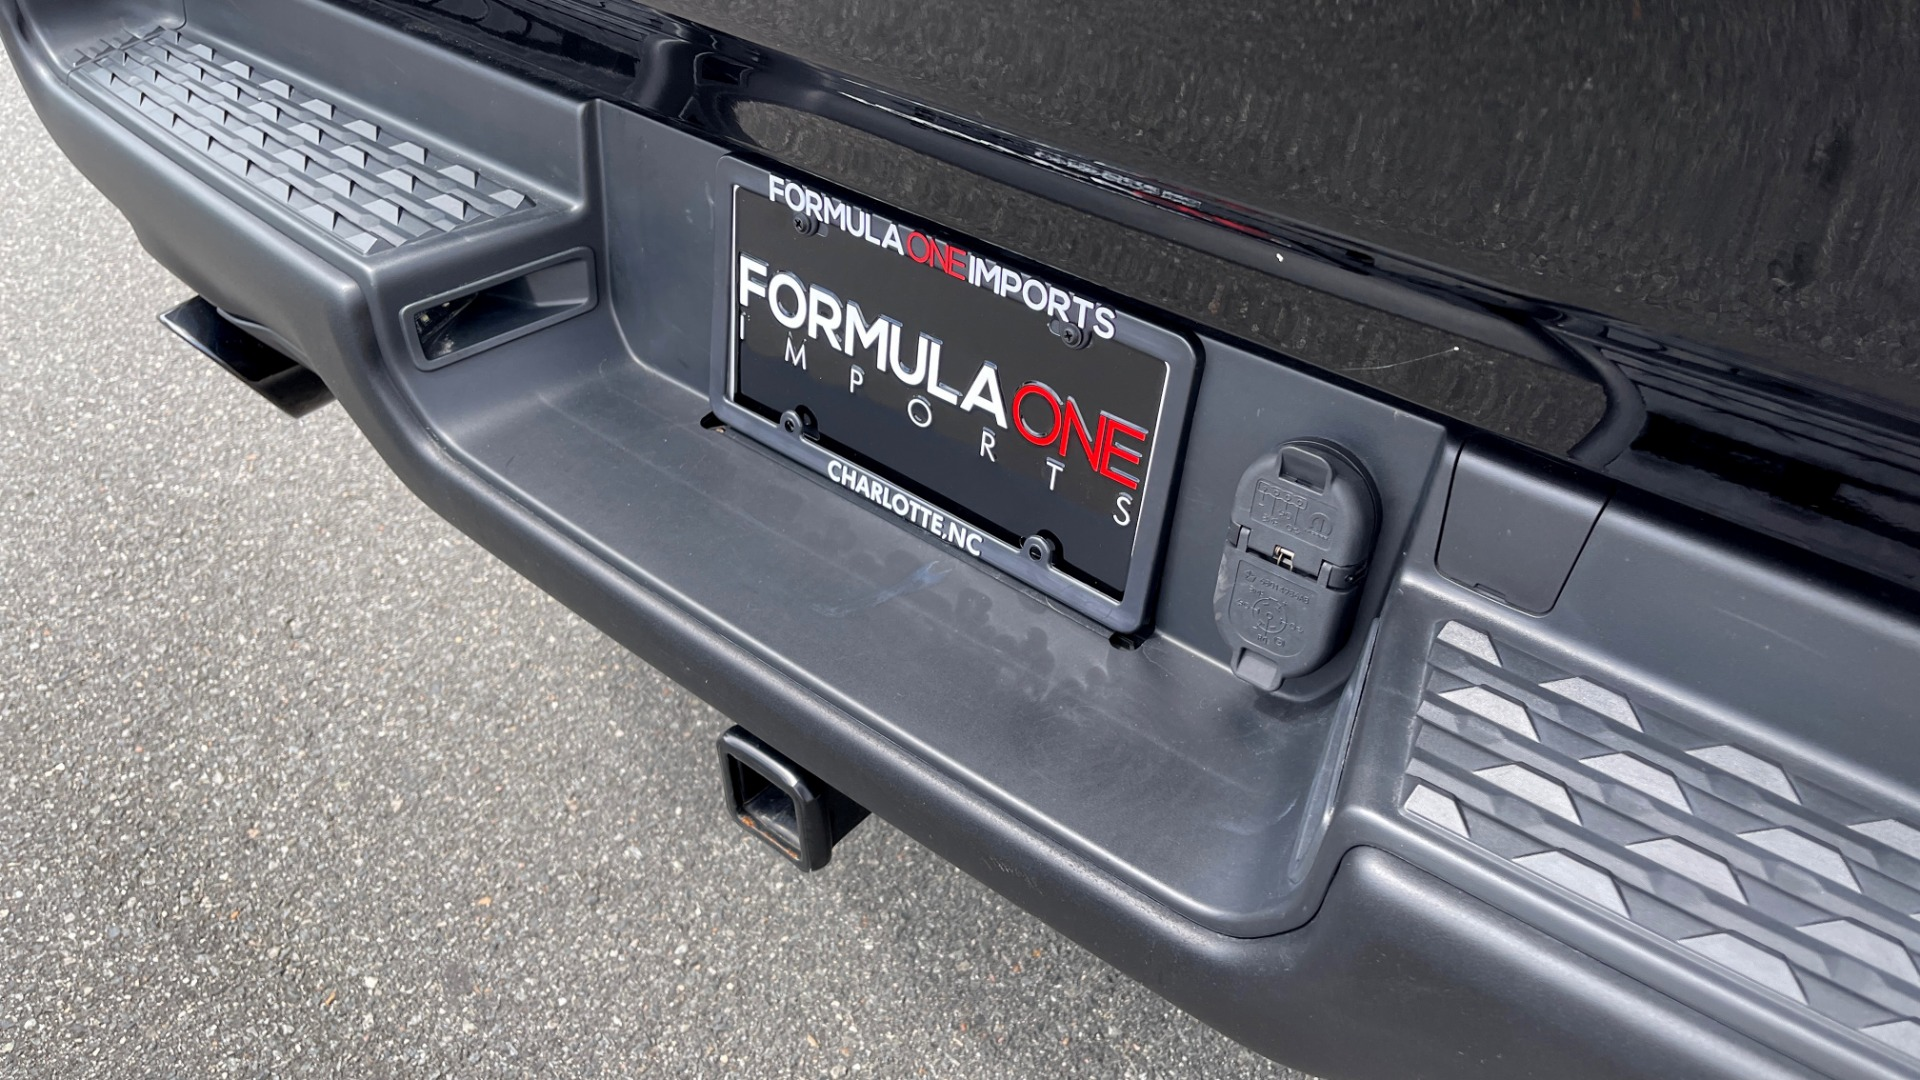 Used 2019 Ram 1500 REBEL QUADCAB 4X4 / 5.7L HEMI / 8-SPD AUTO / REMOTE START / PARK ASSIST for sale $44,495 at Formula Imports in Charlotte NC 28227 23